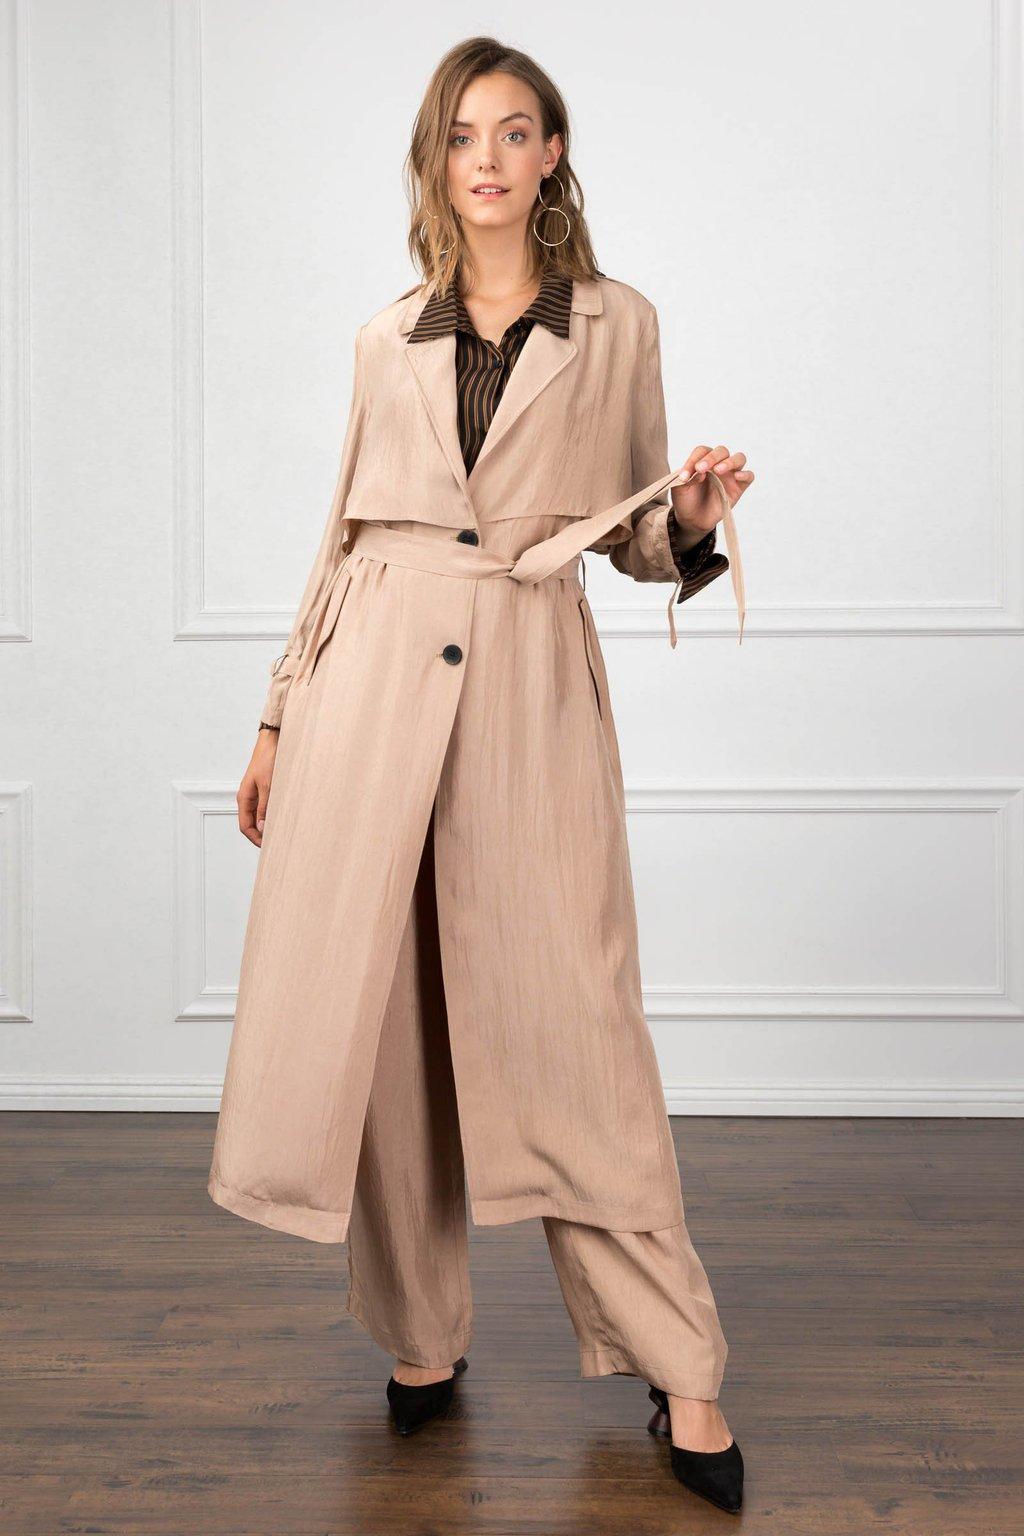 silk tan beige trench coat by j.ing women's clothing